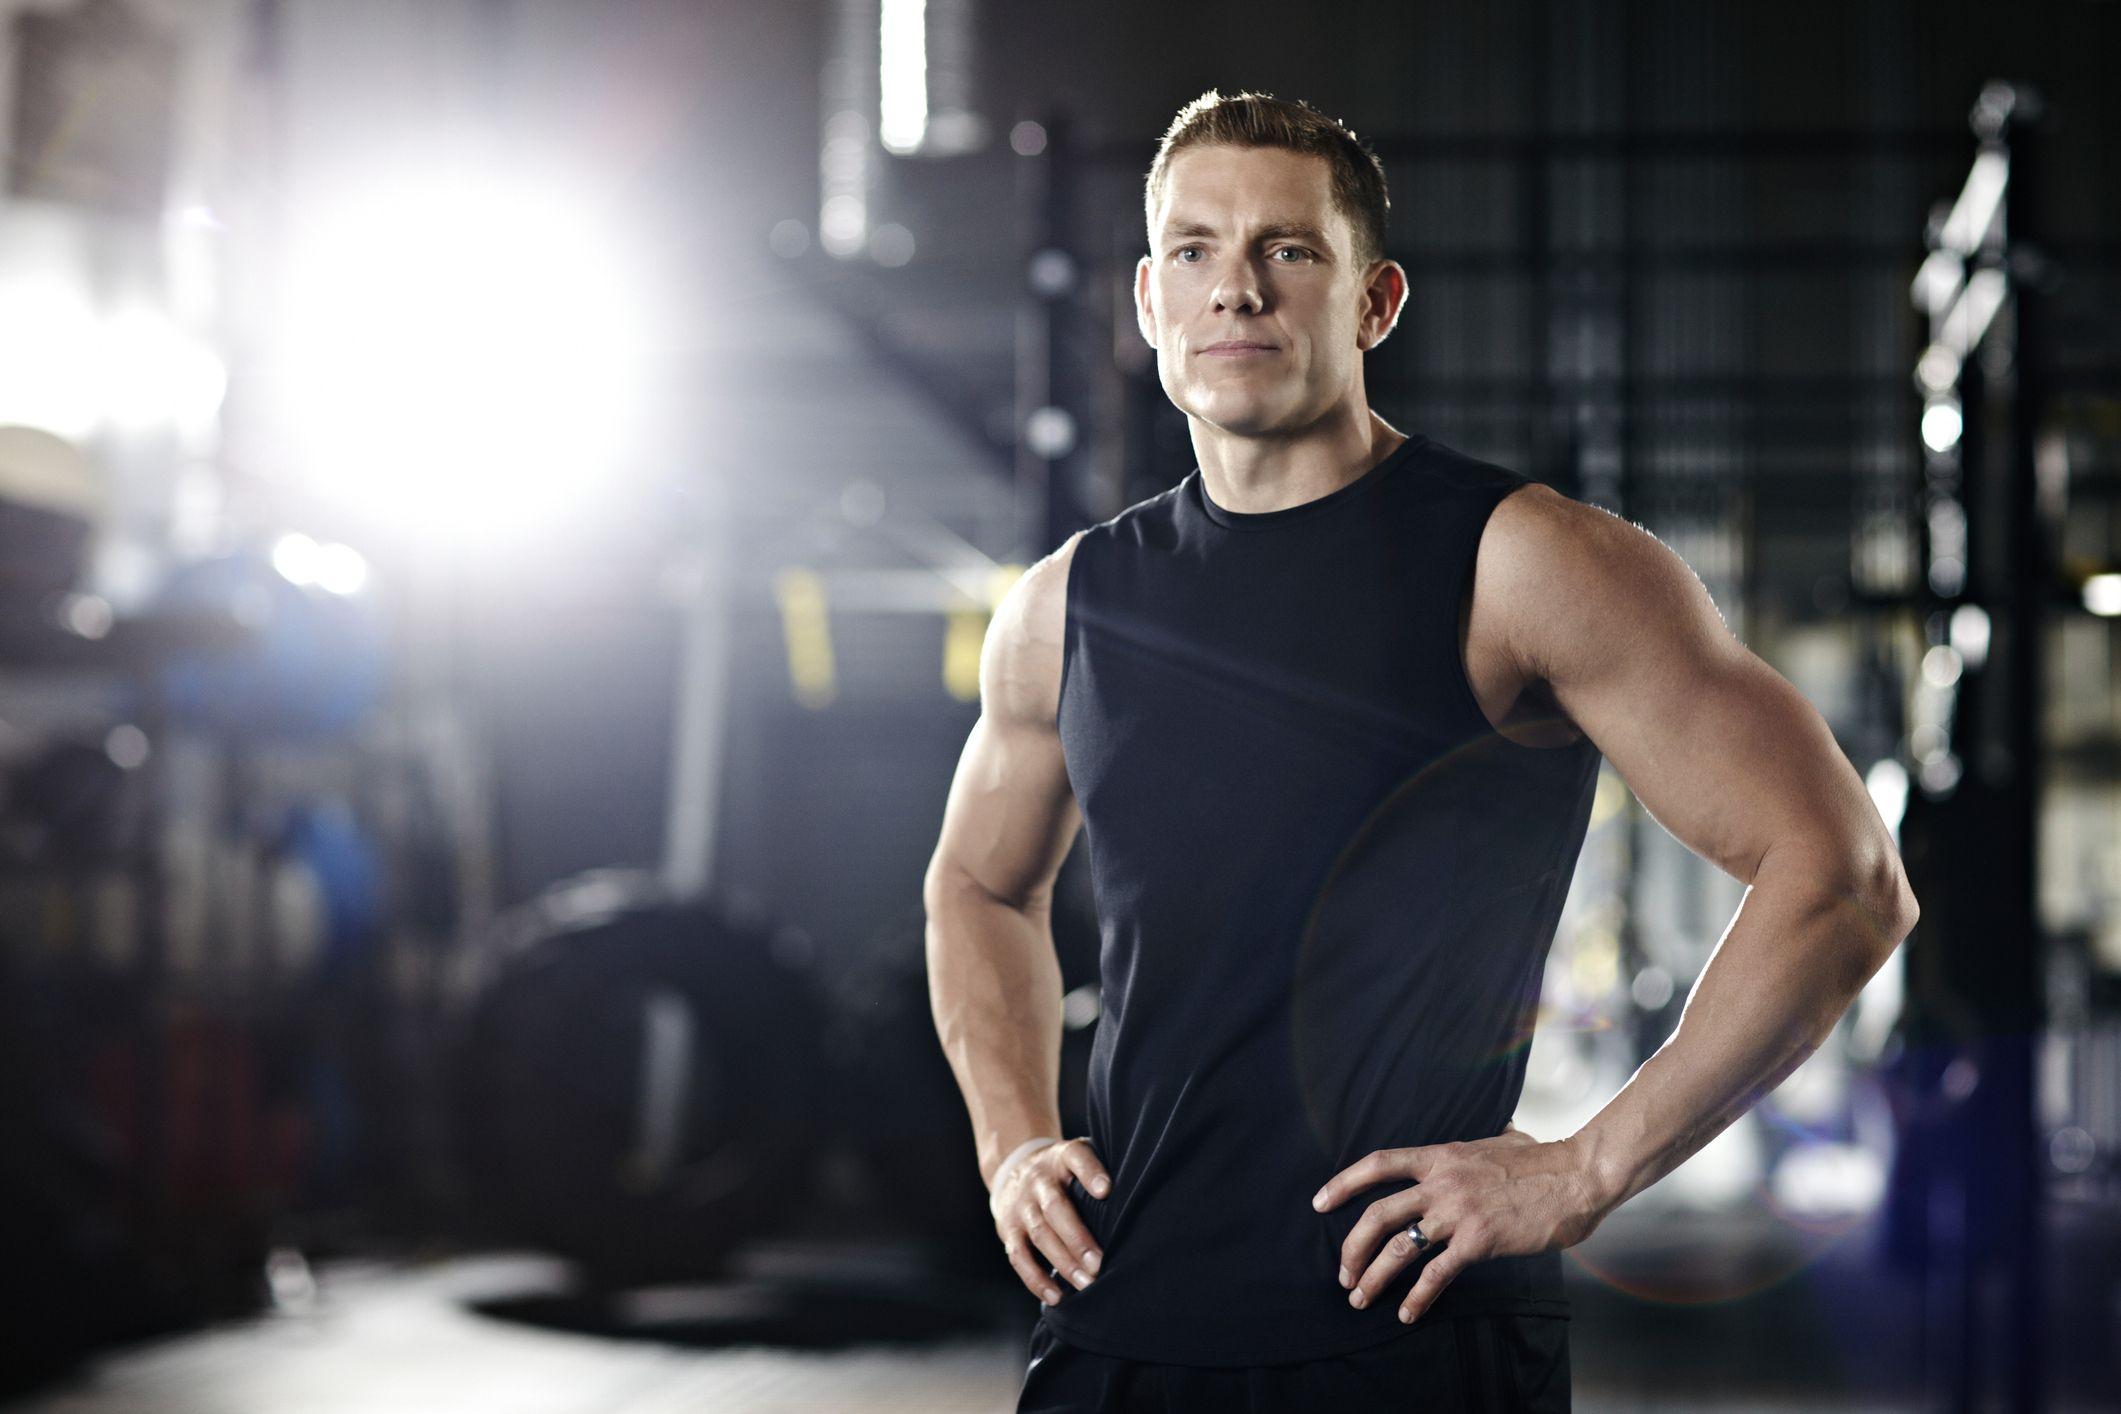 Fitness Trainers Seek Income During the Coronavirus Pandemic